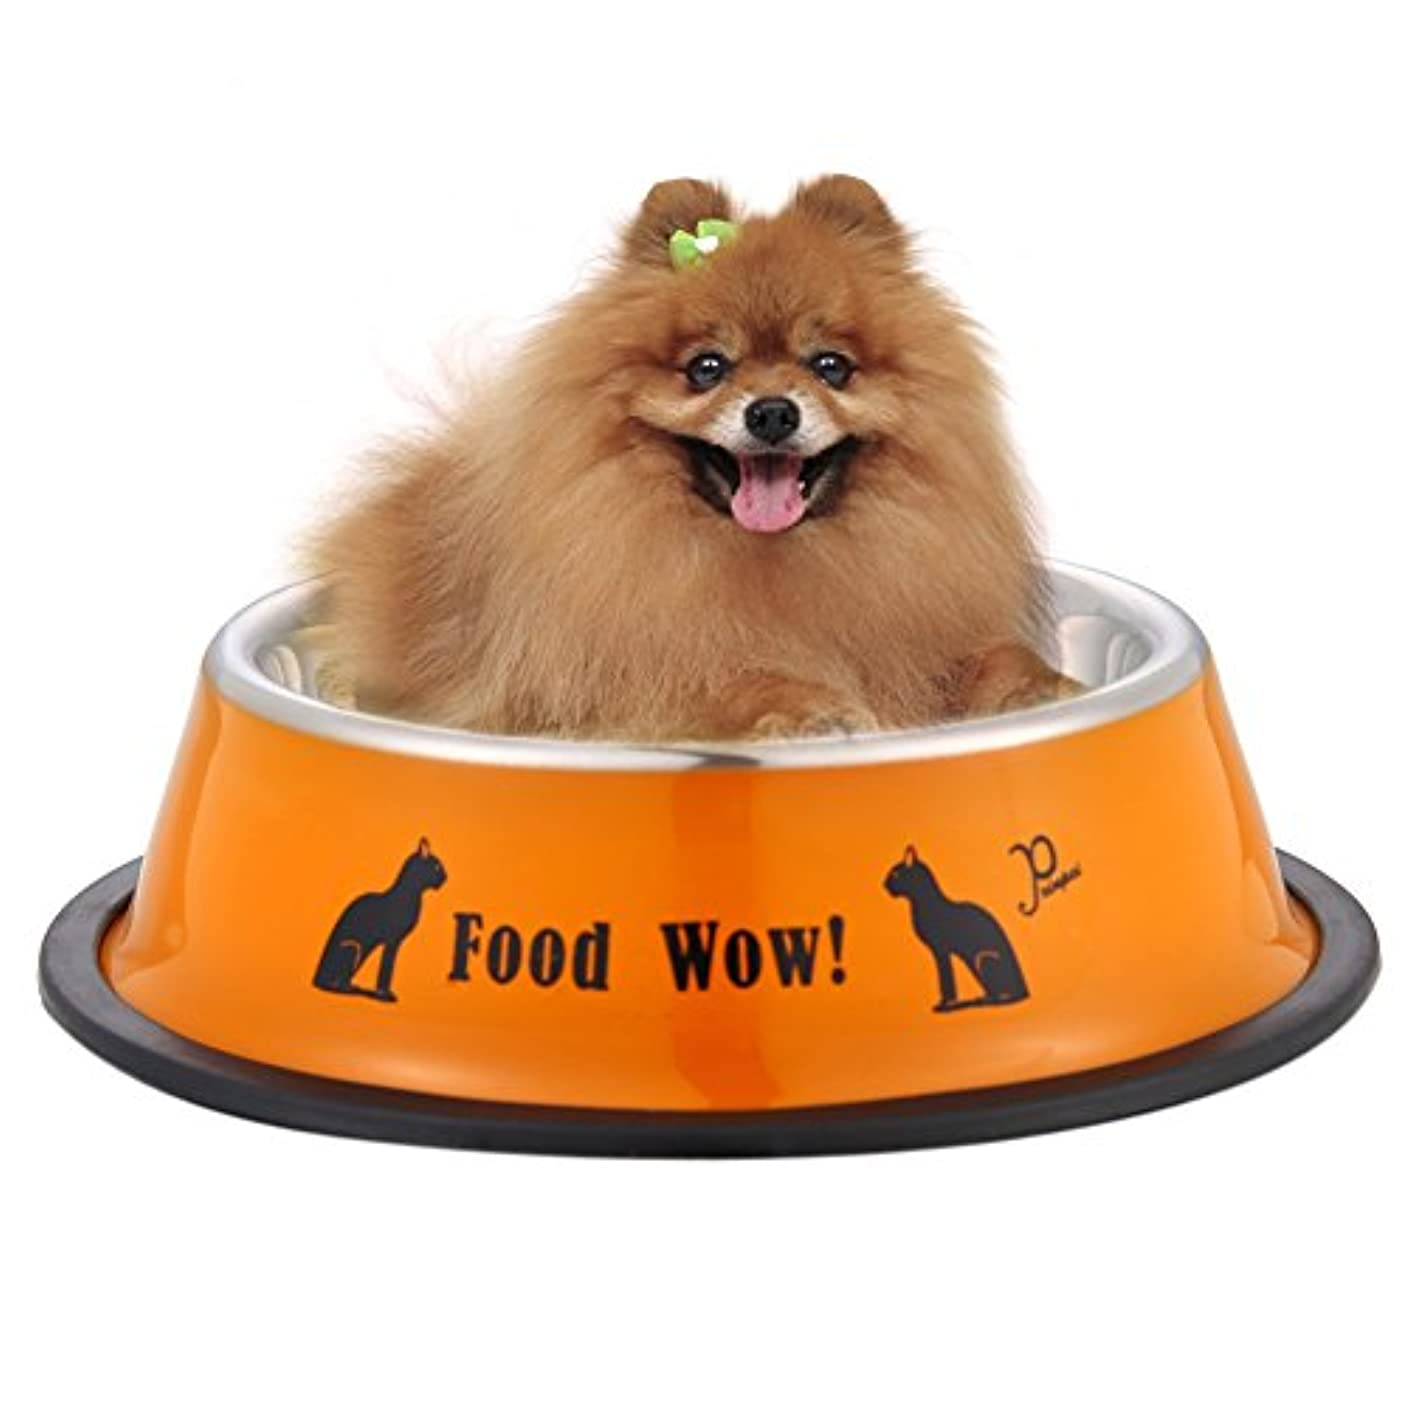 Demiawaking ペットボウル 犬/猫食器 早食い防止食器 給餌容器 給水容器 くり食べる ペット食事 ボウル 皿 食器 イエロー